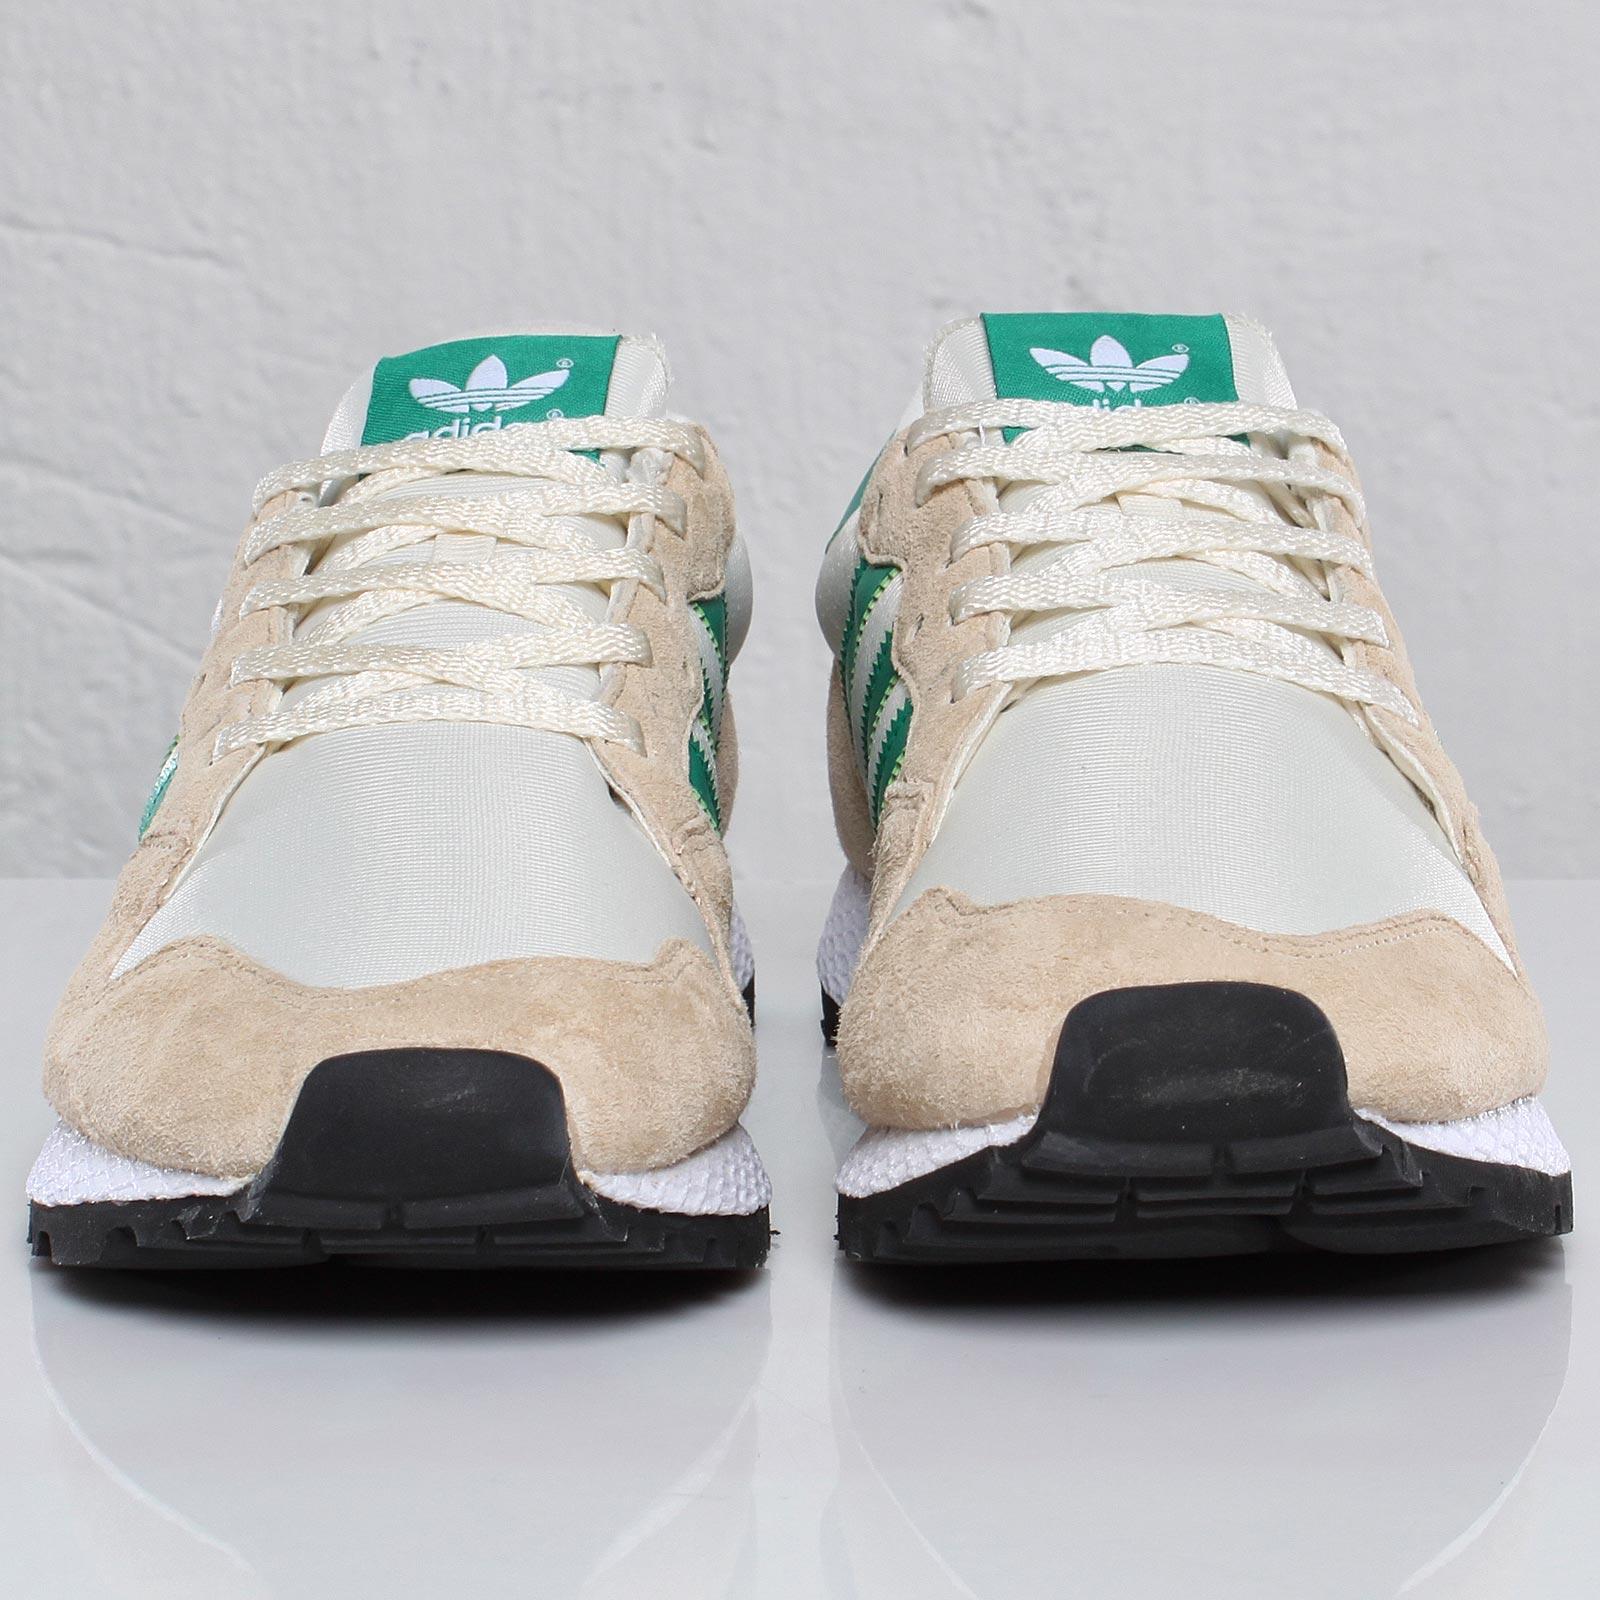 best service d3ef5 d25b6 adidas ZX 380 - 101396 - Sneakersnstuff   sneakers ...